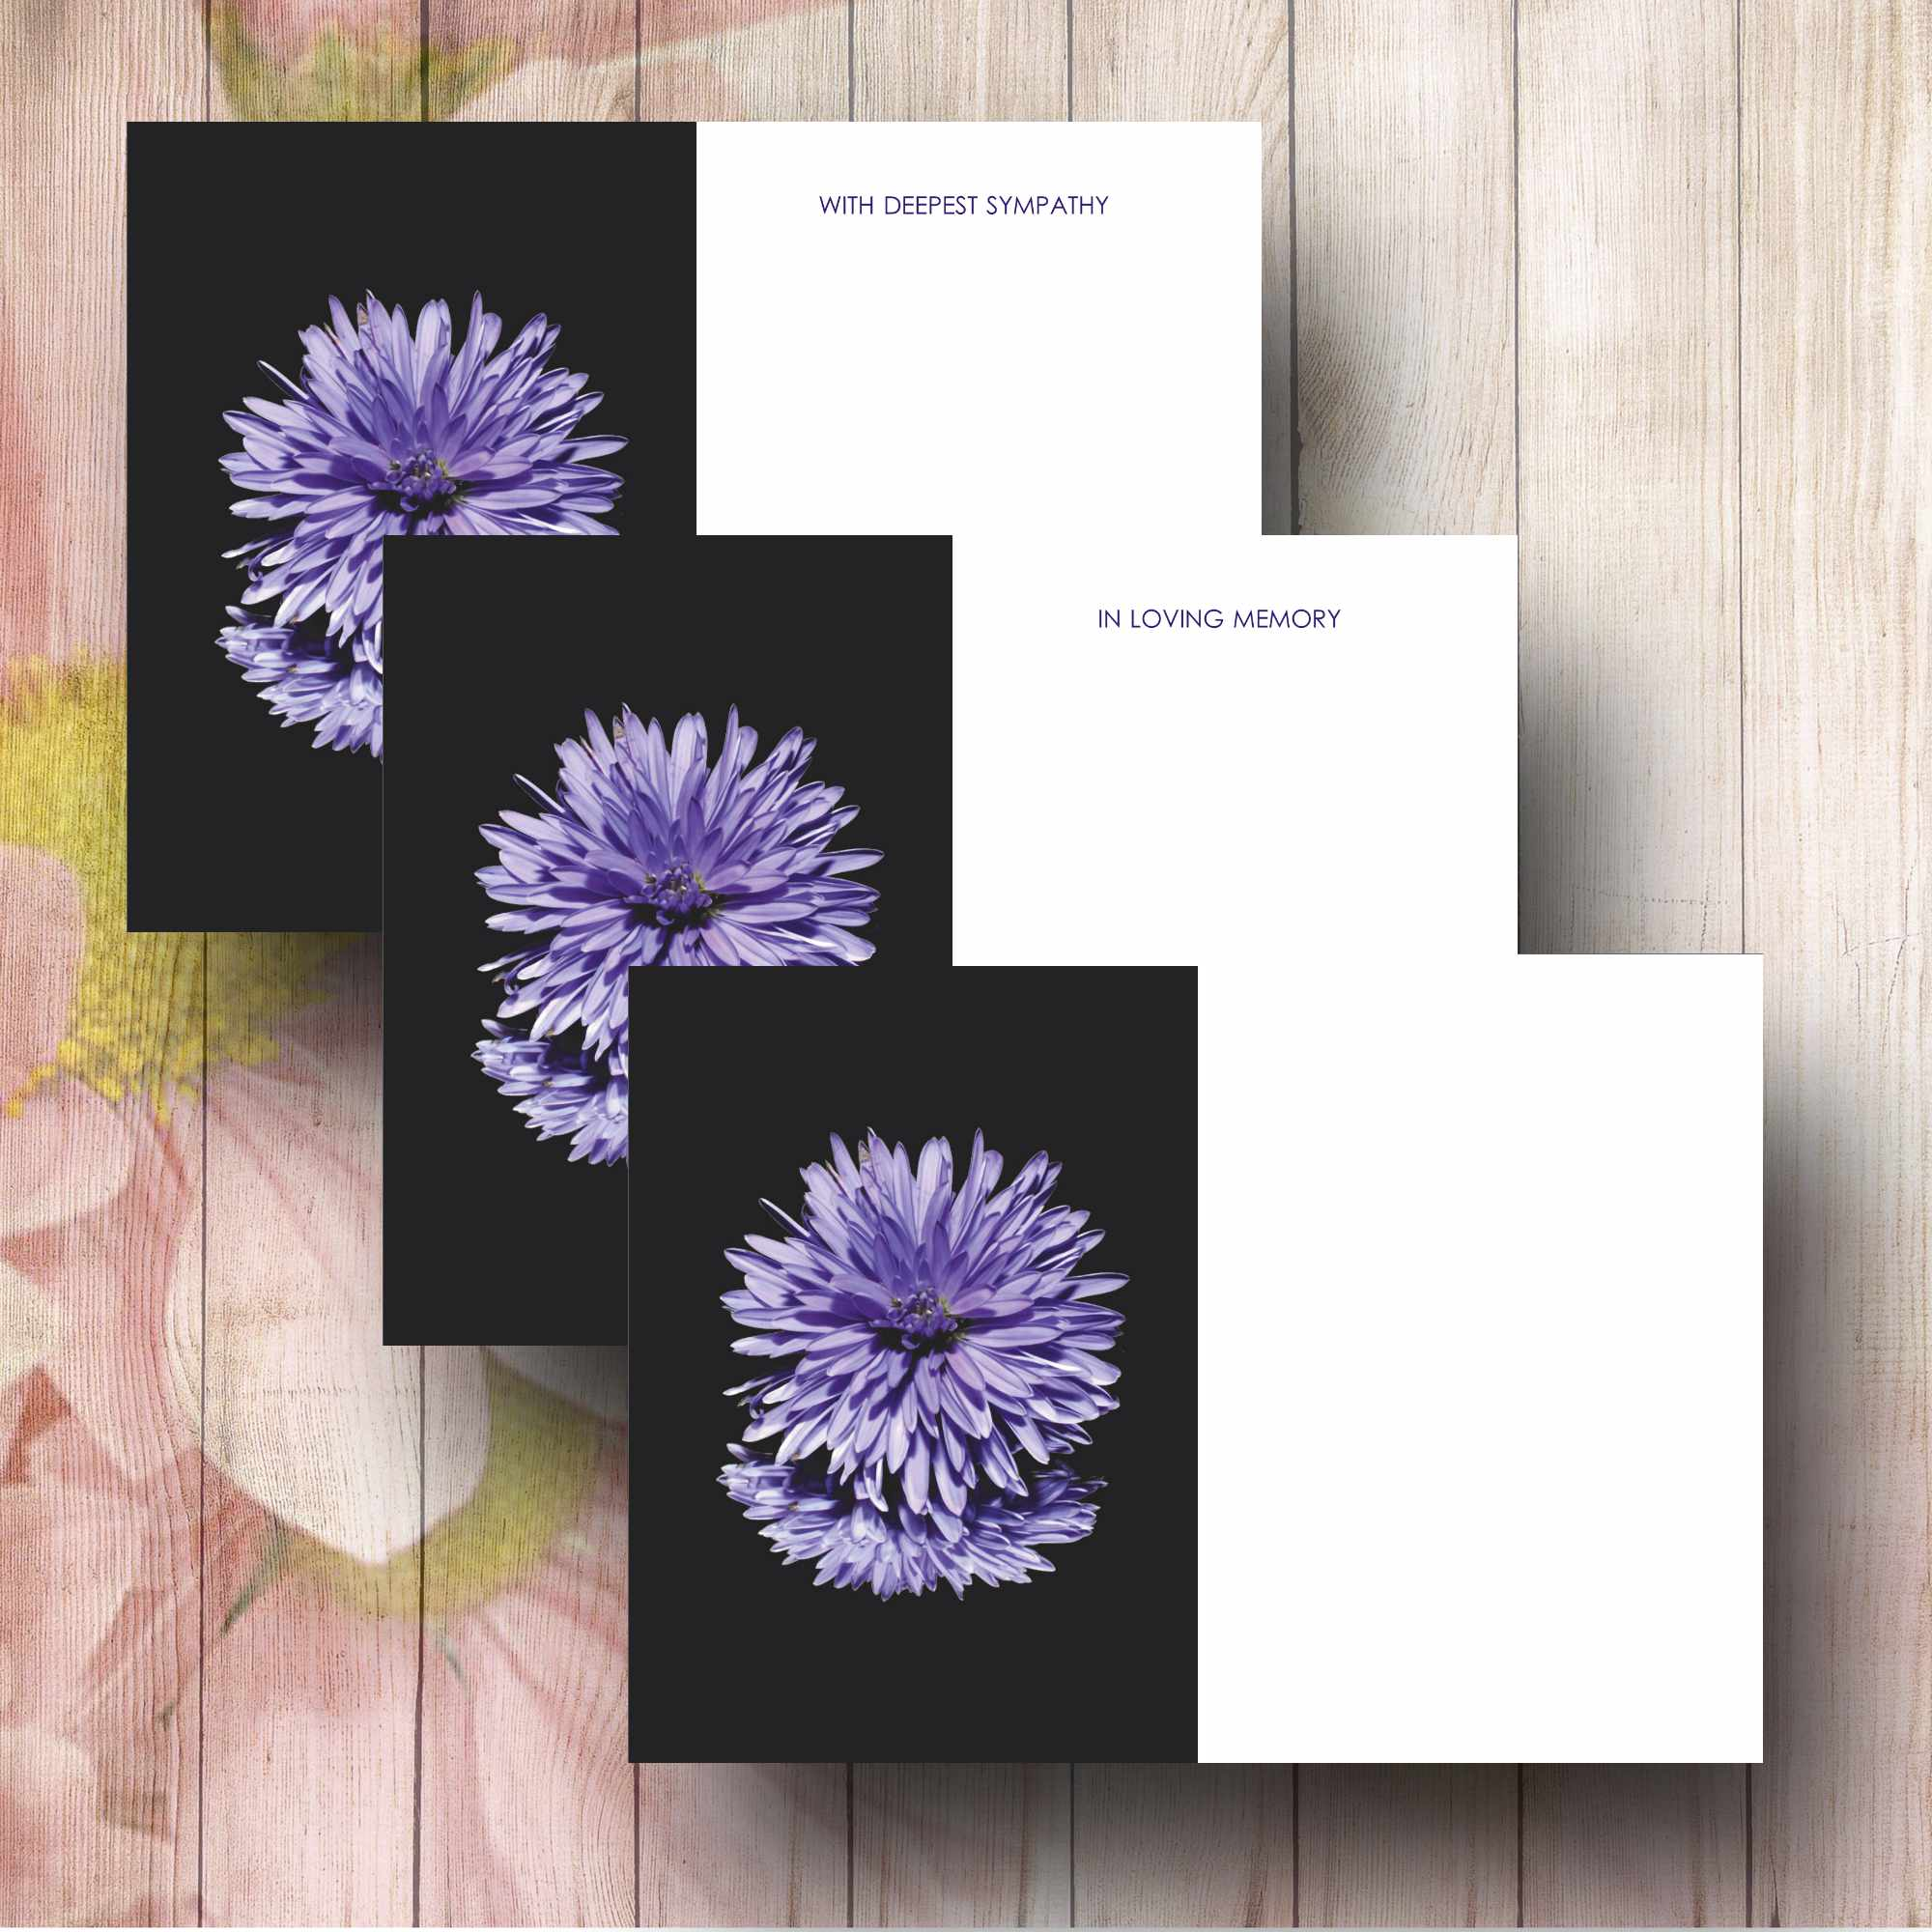 Mauve dhalia flower funeral florist message card greeting card funeral message card fc3 purple aster izmirmasajfo